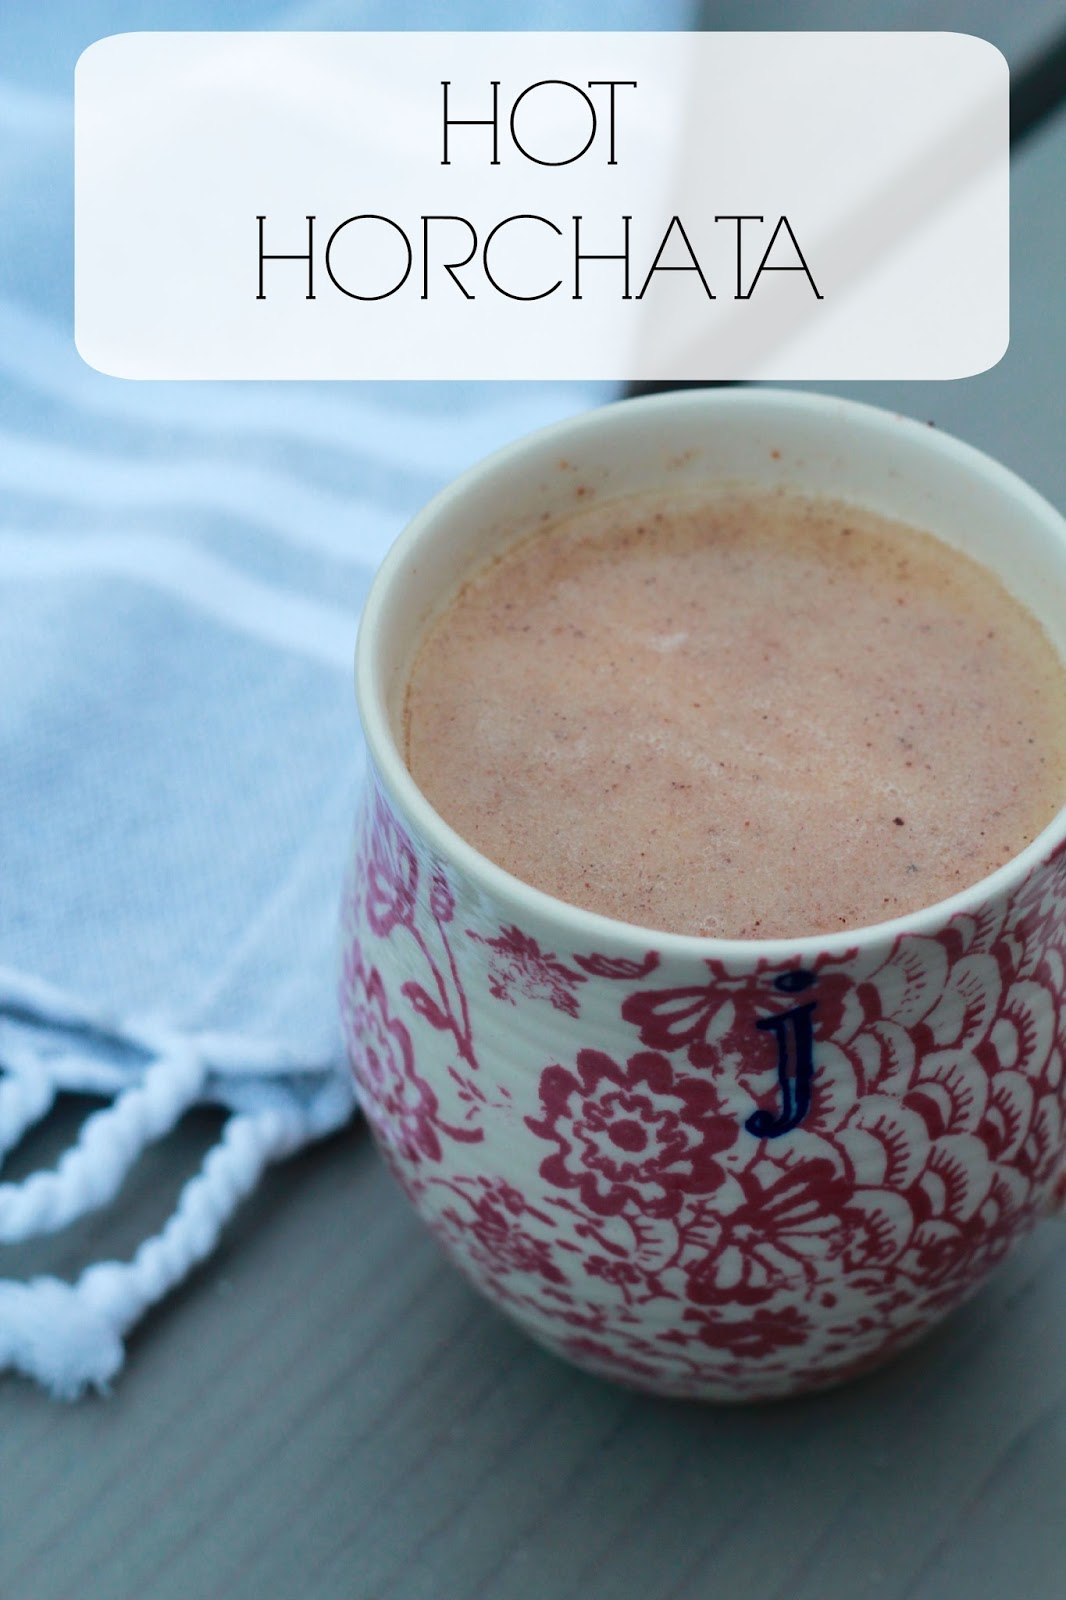 Hot Horchata